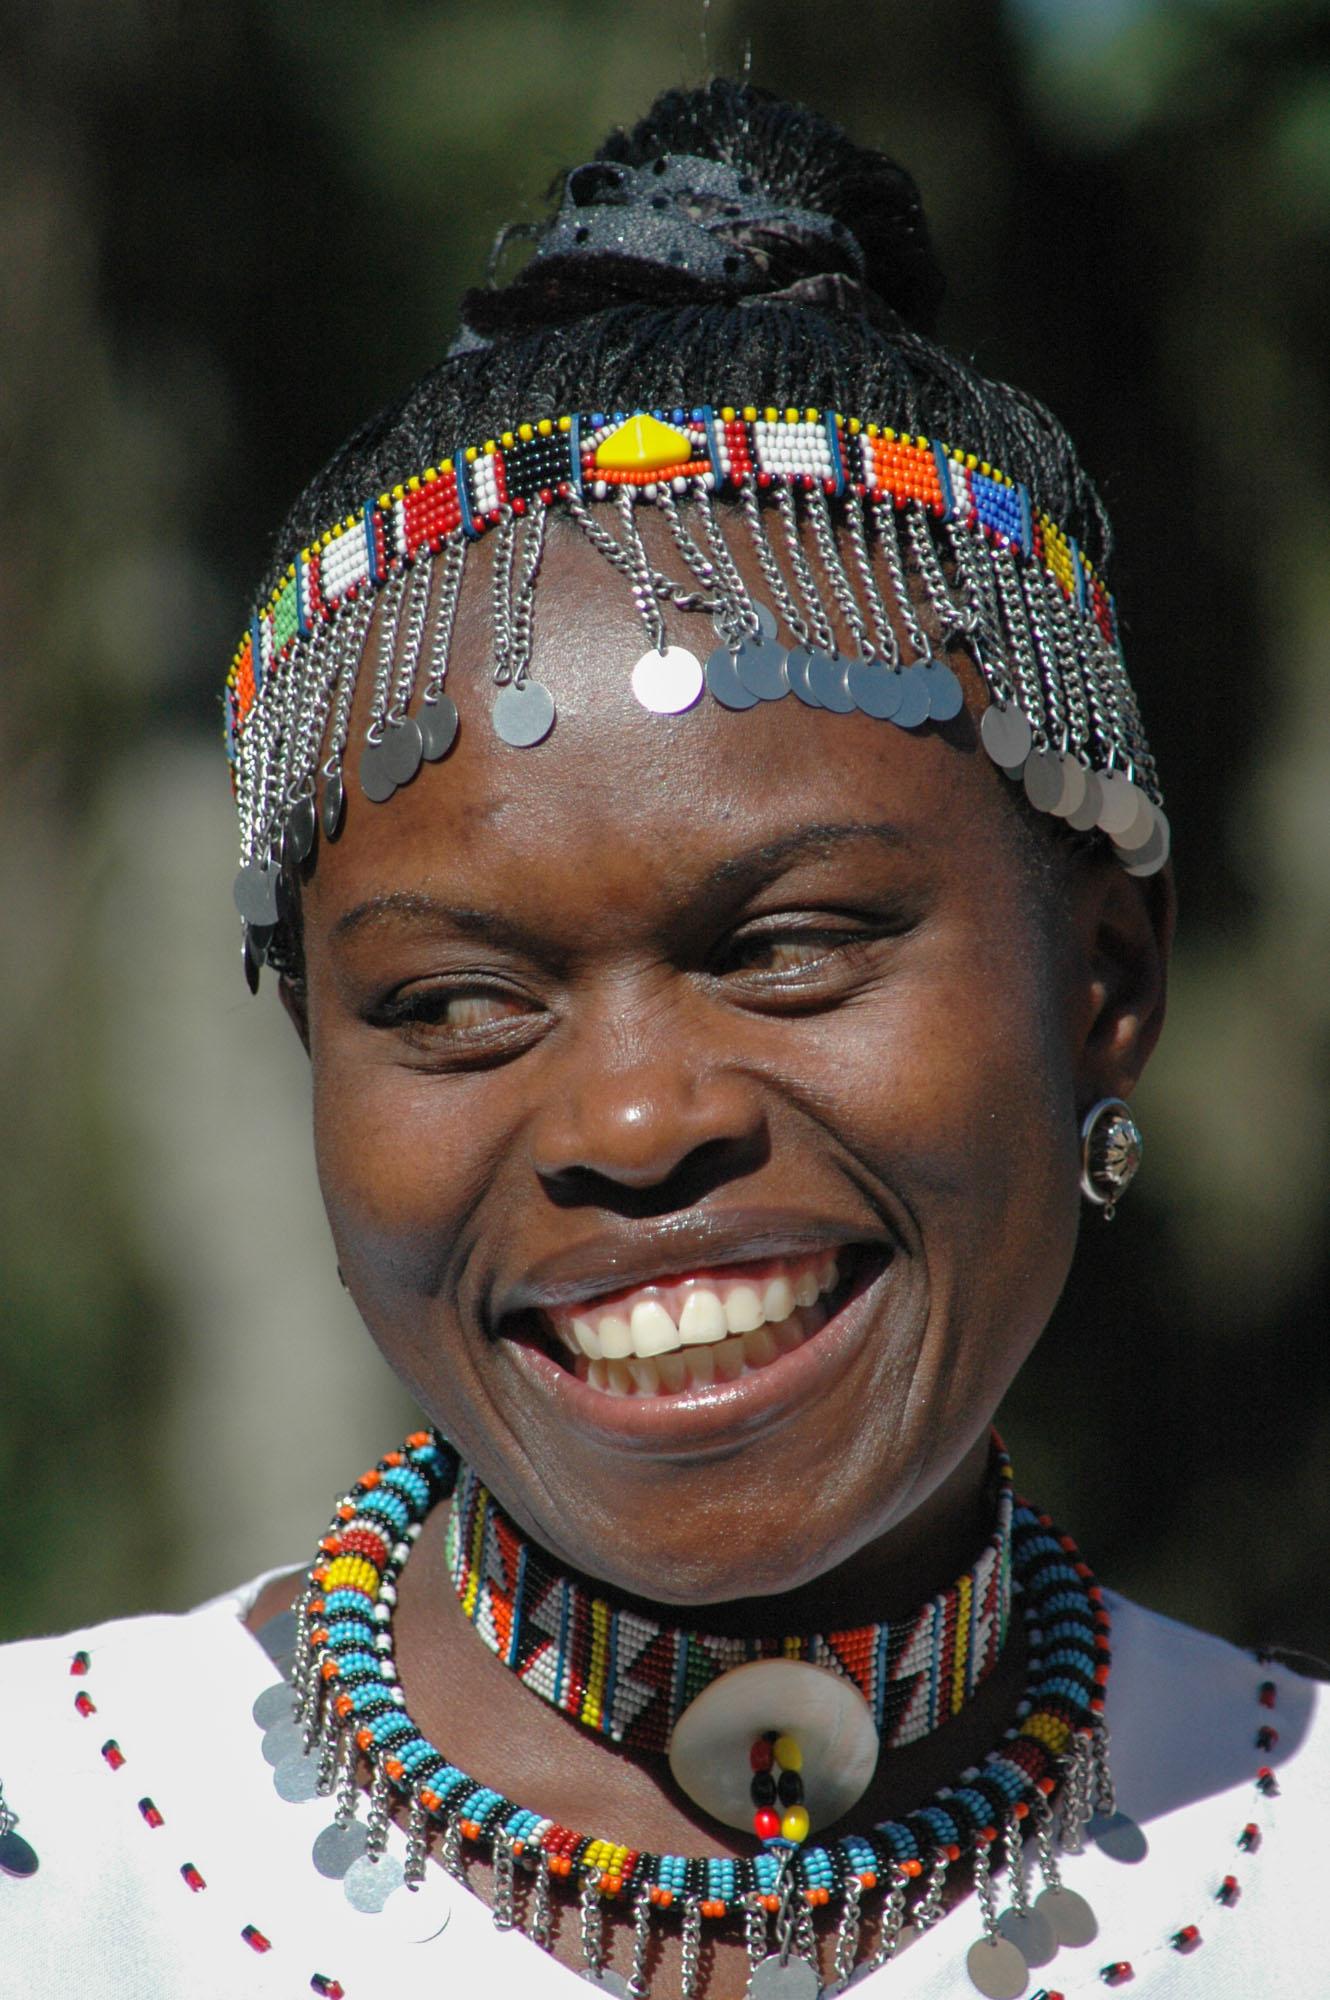 claire--portrait-kenya-2010-10-27.jpg